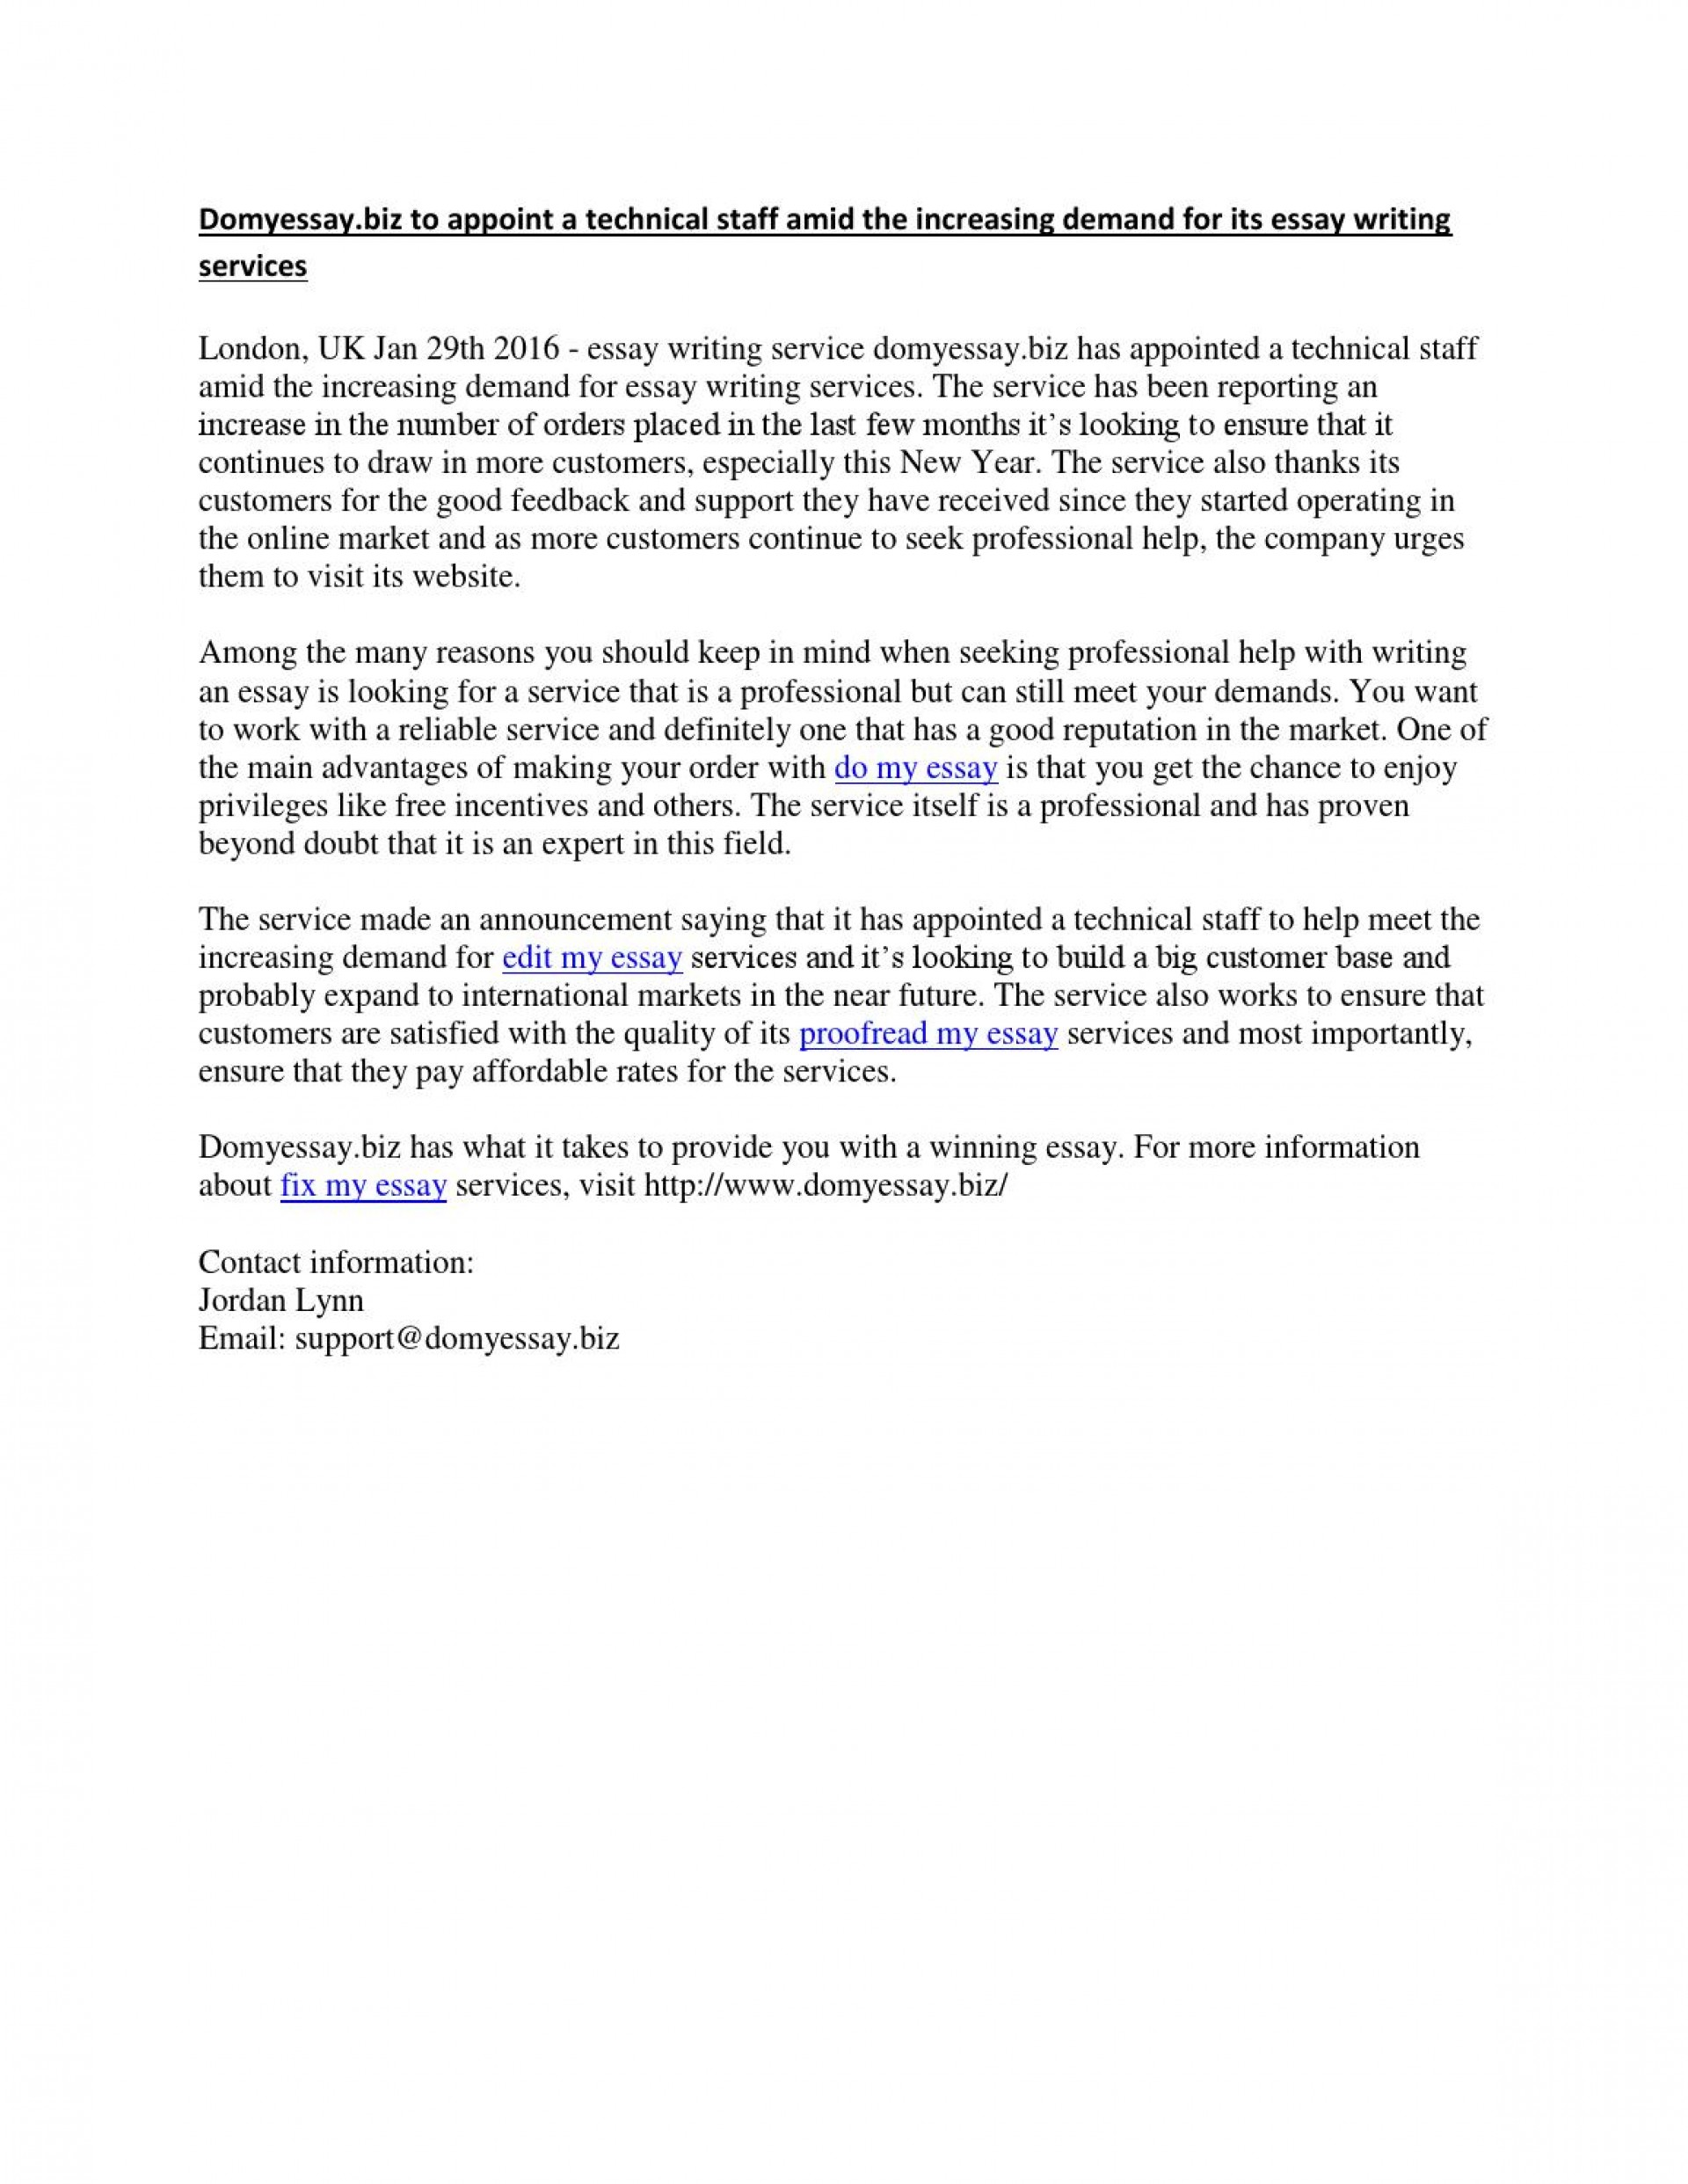 018 Essay Example Page 1 Fix Singular My College Generator Free Help 1920